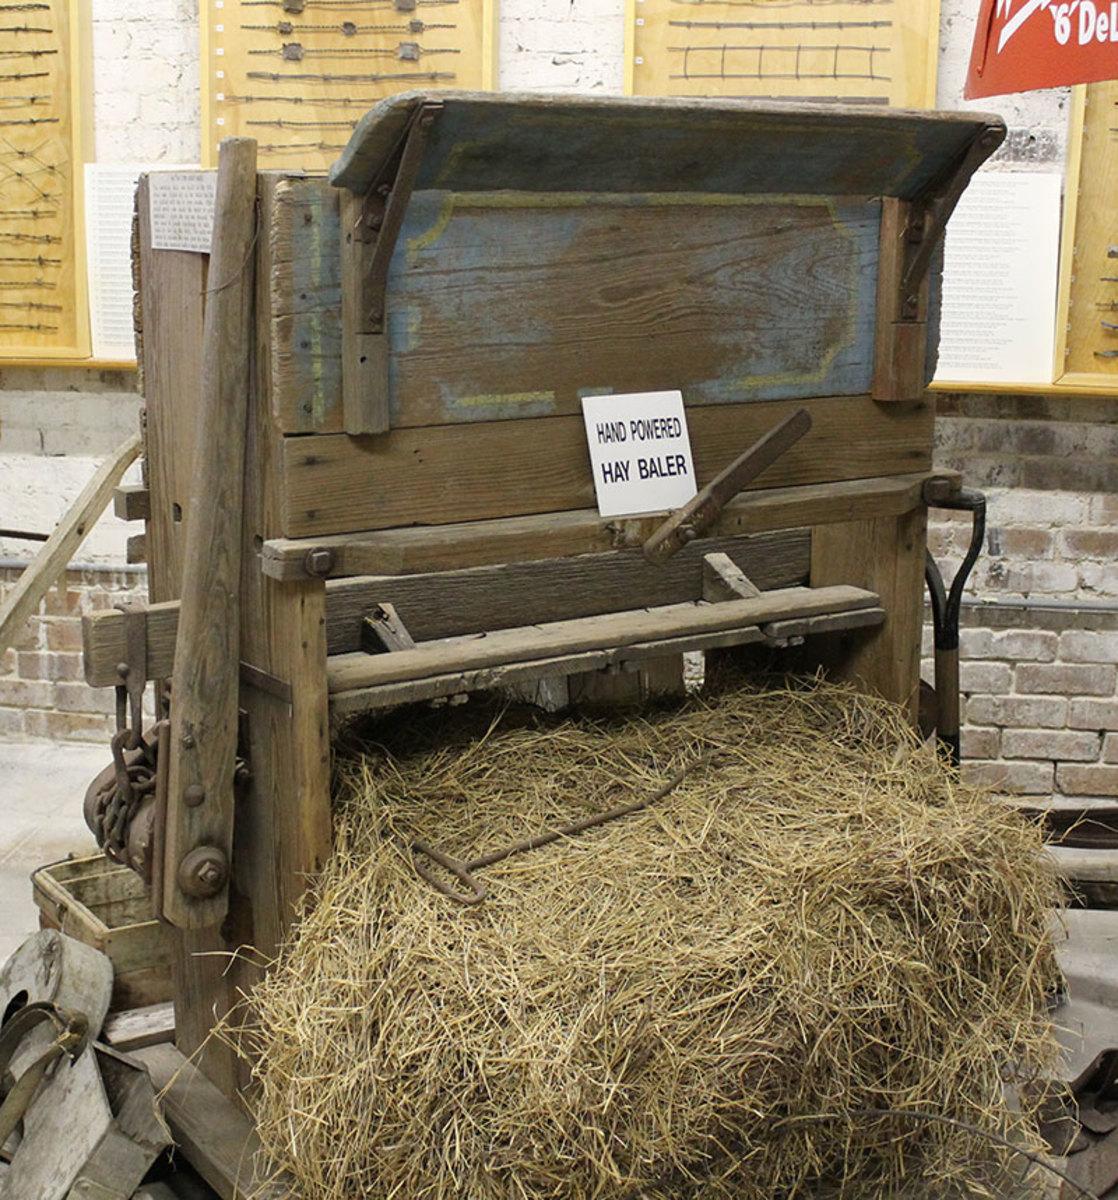 Hay Bale Maker